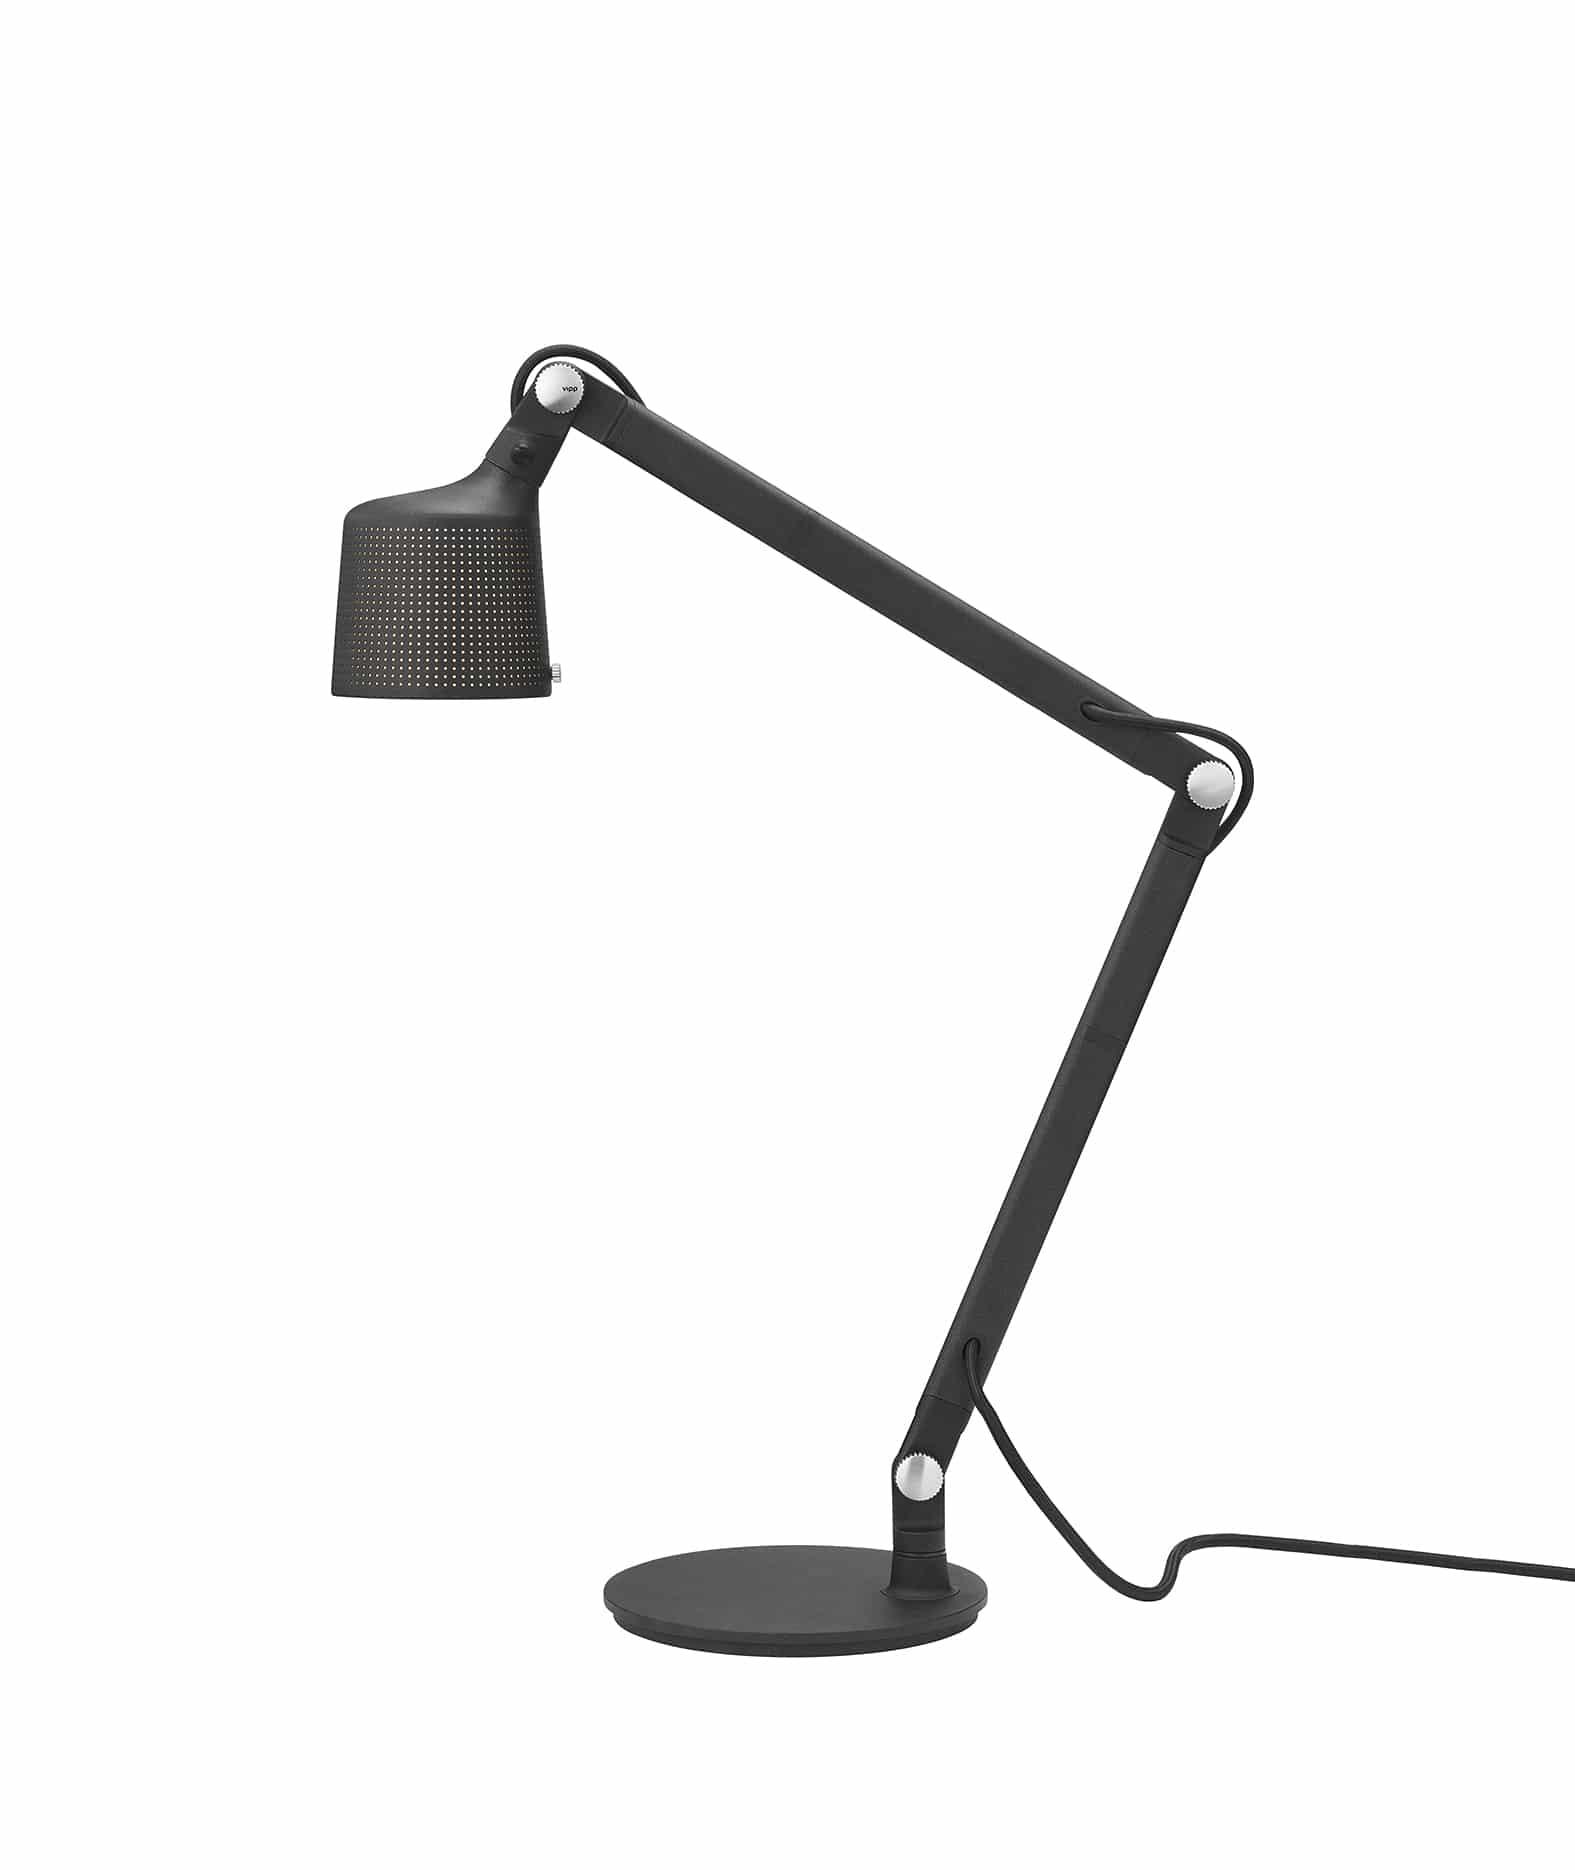 vipp black table lamp press low